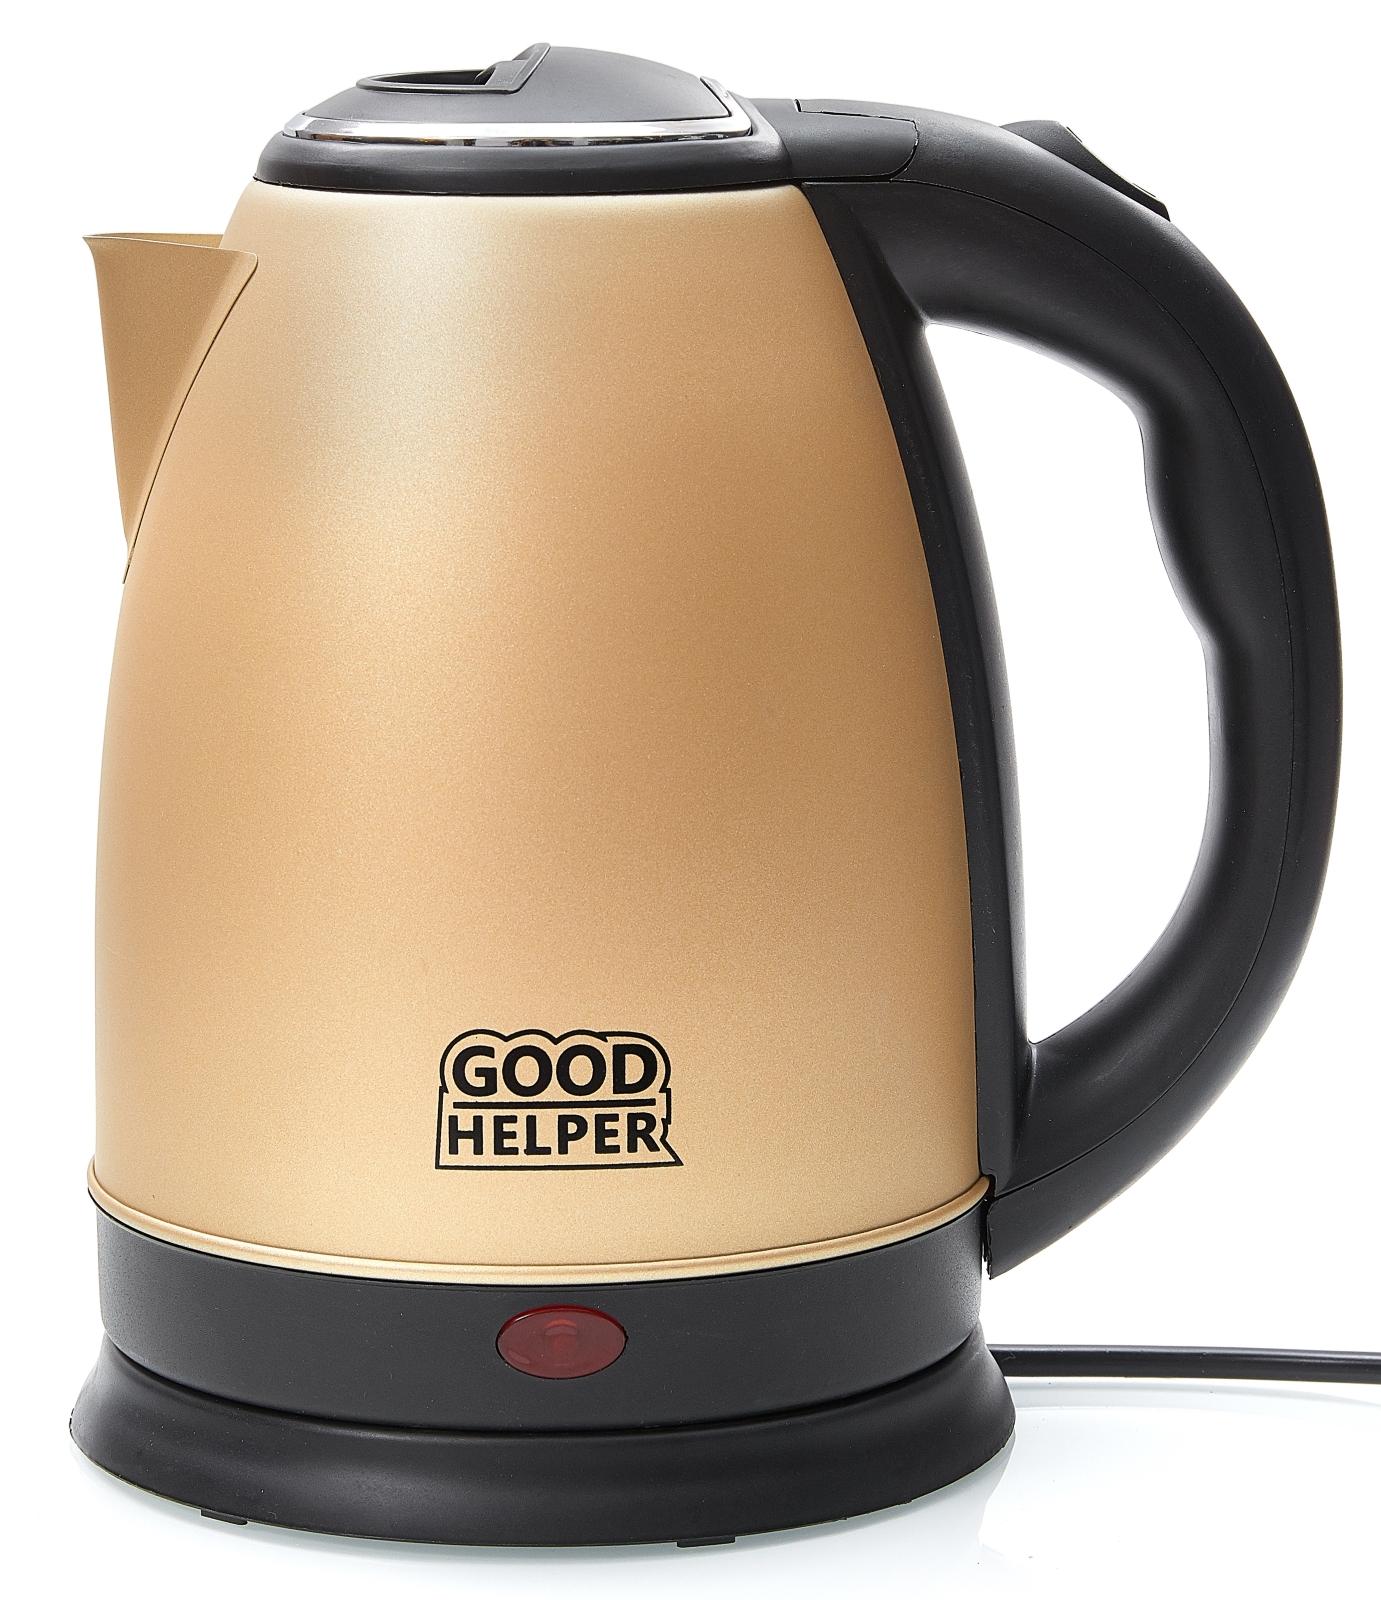 Электрический чайник GOODHELPER Чайник электрический KS-181C золото, золотой цена и фото